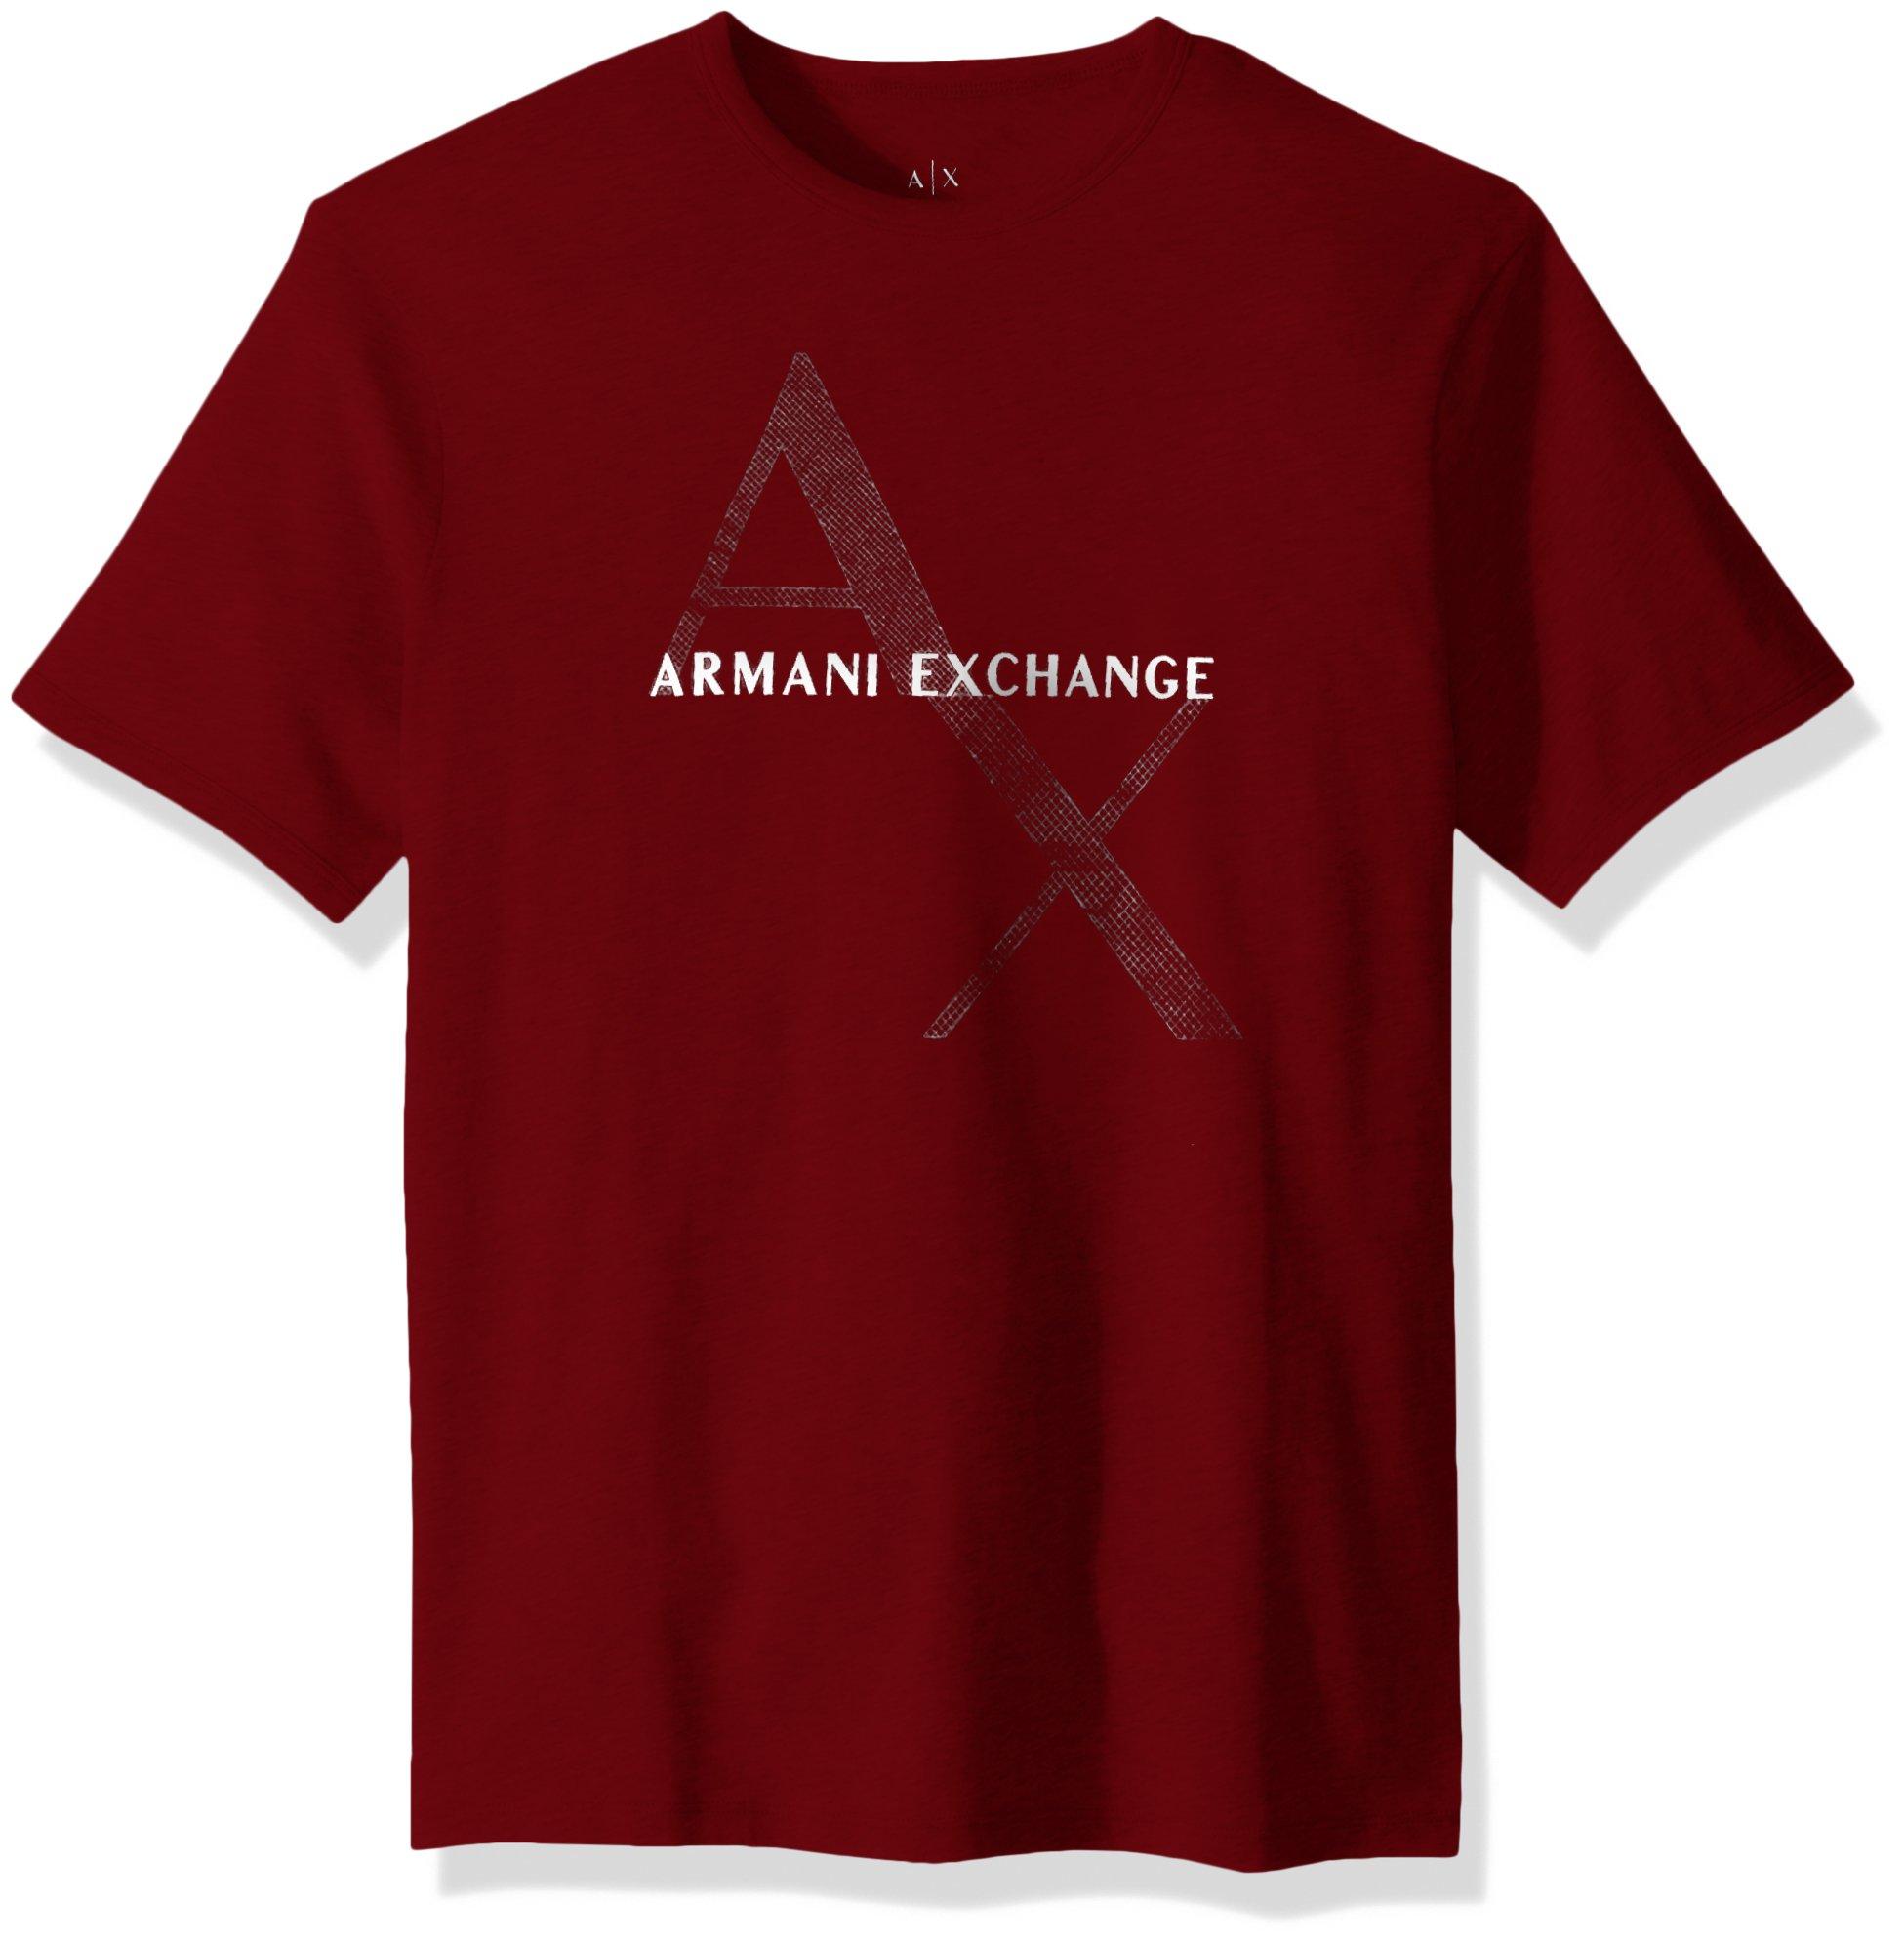 A|X Armani Exchange Men's Classic Cotton Logo Tee, Rhubarb, S